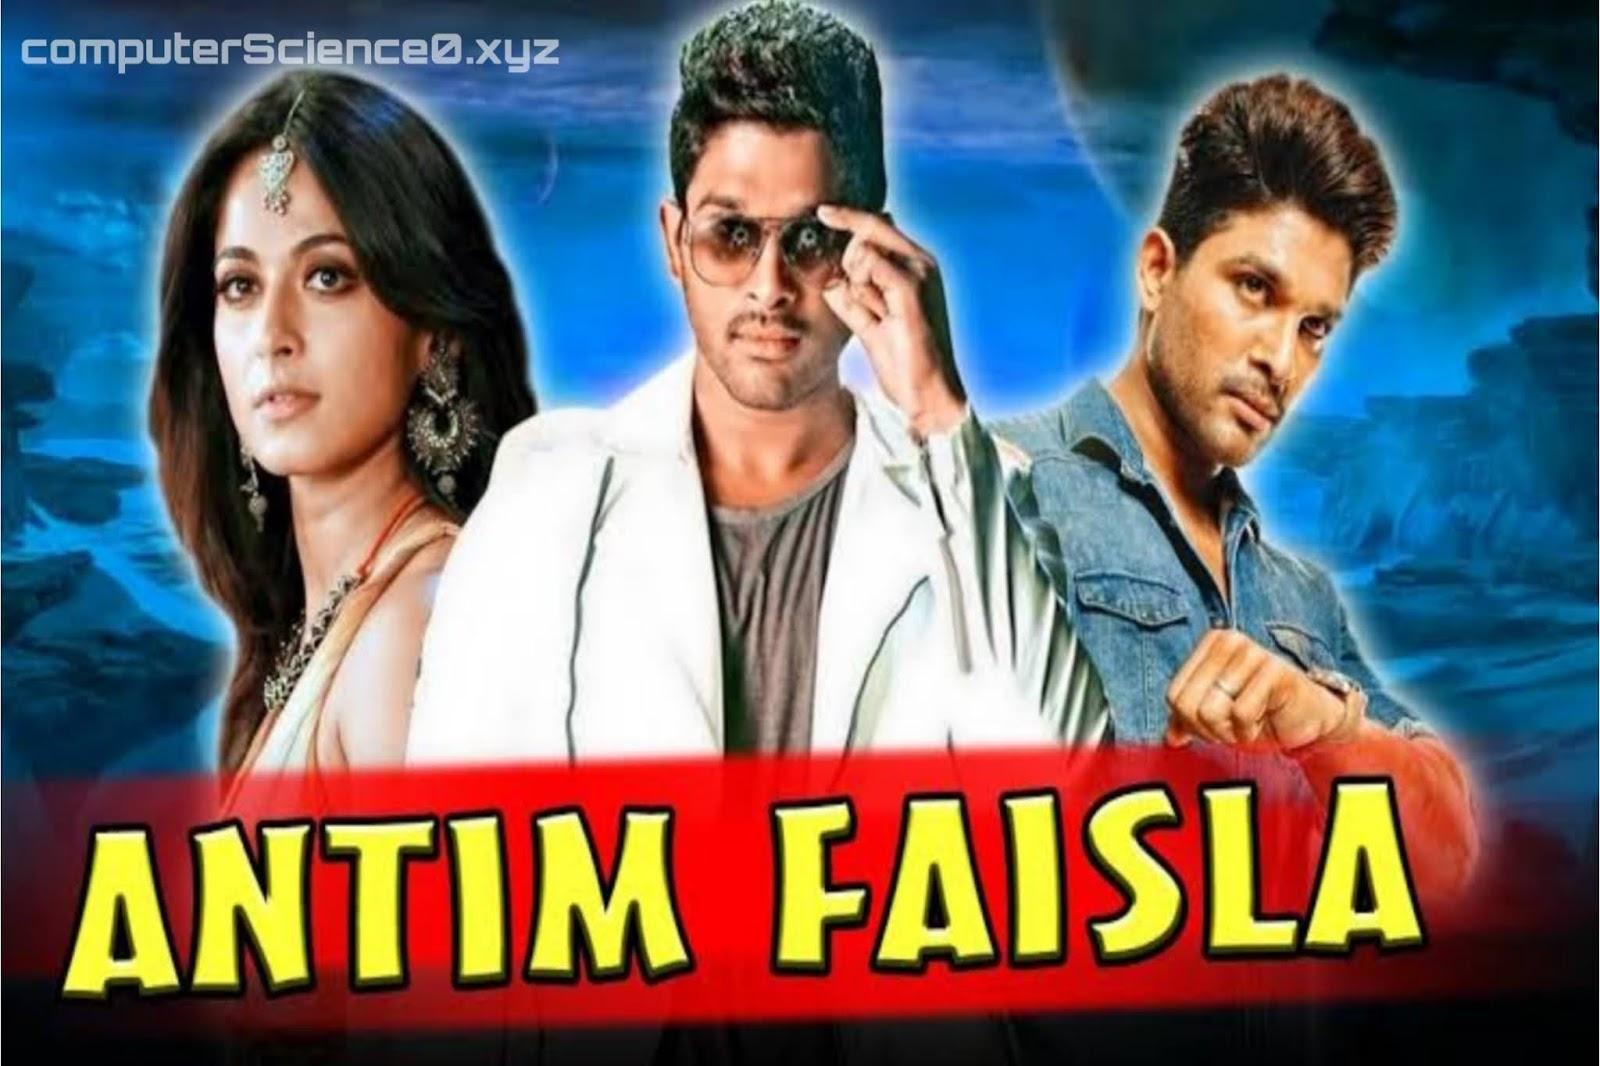 Vedam, Antim Faisala Allu Arjun's Top 19 movies of all time